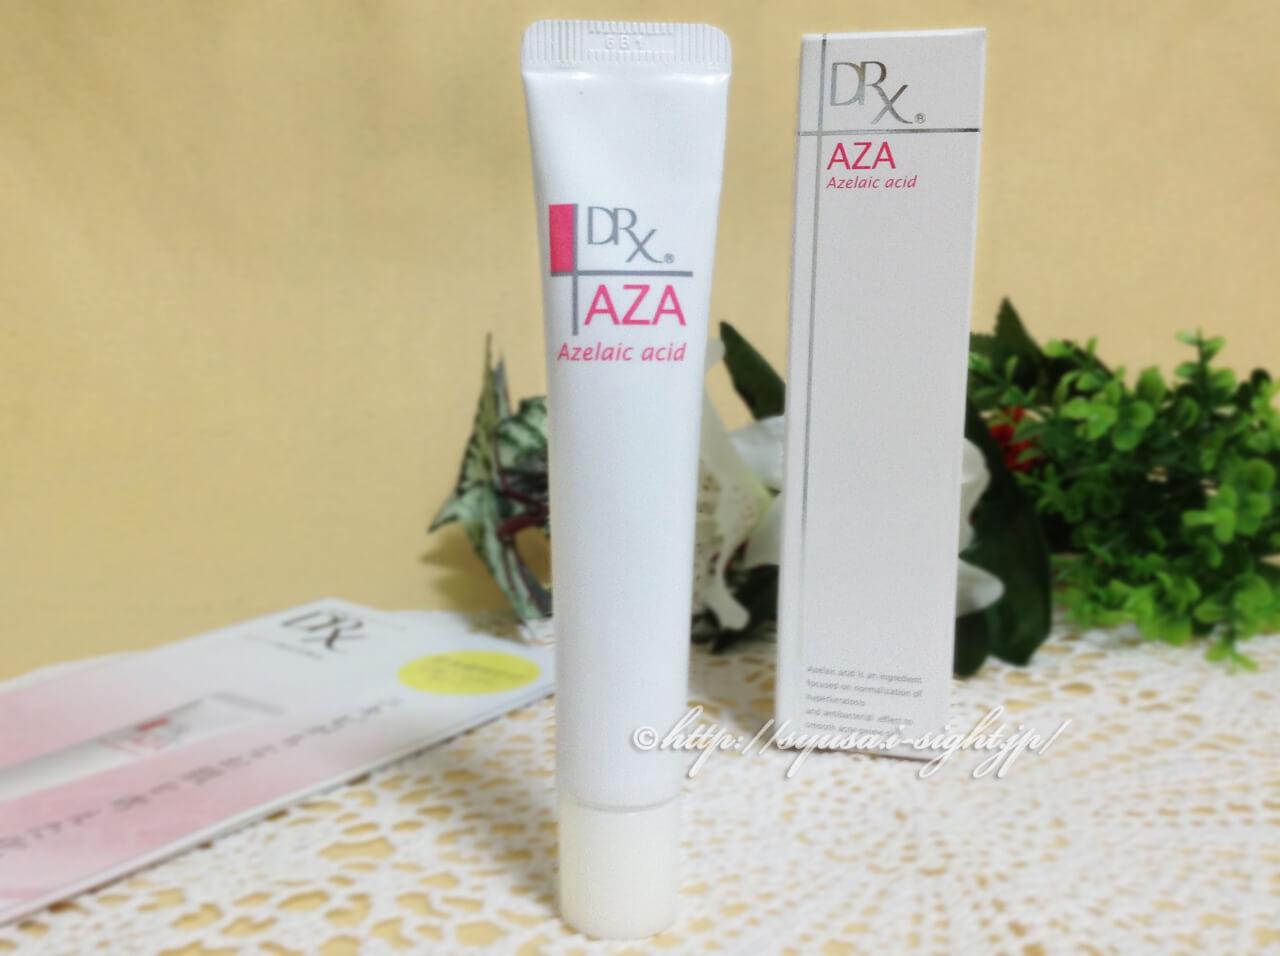 DRX-AZAクリア口コミ